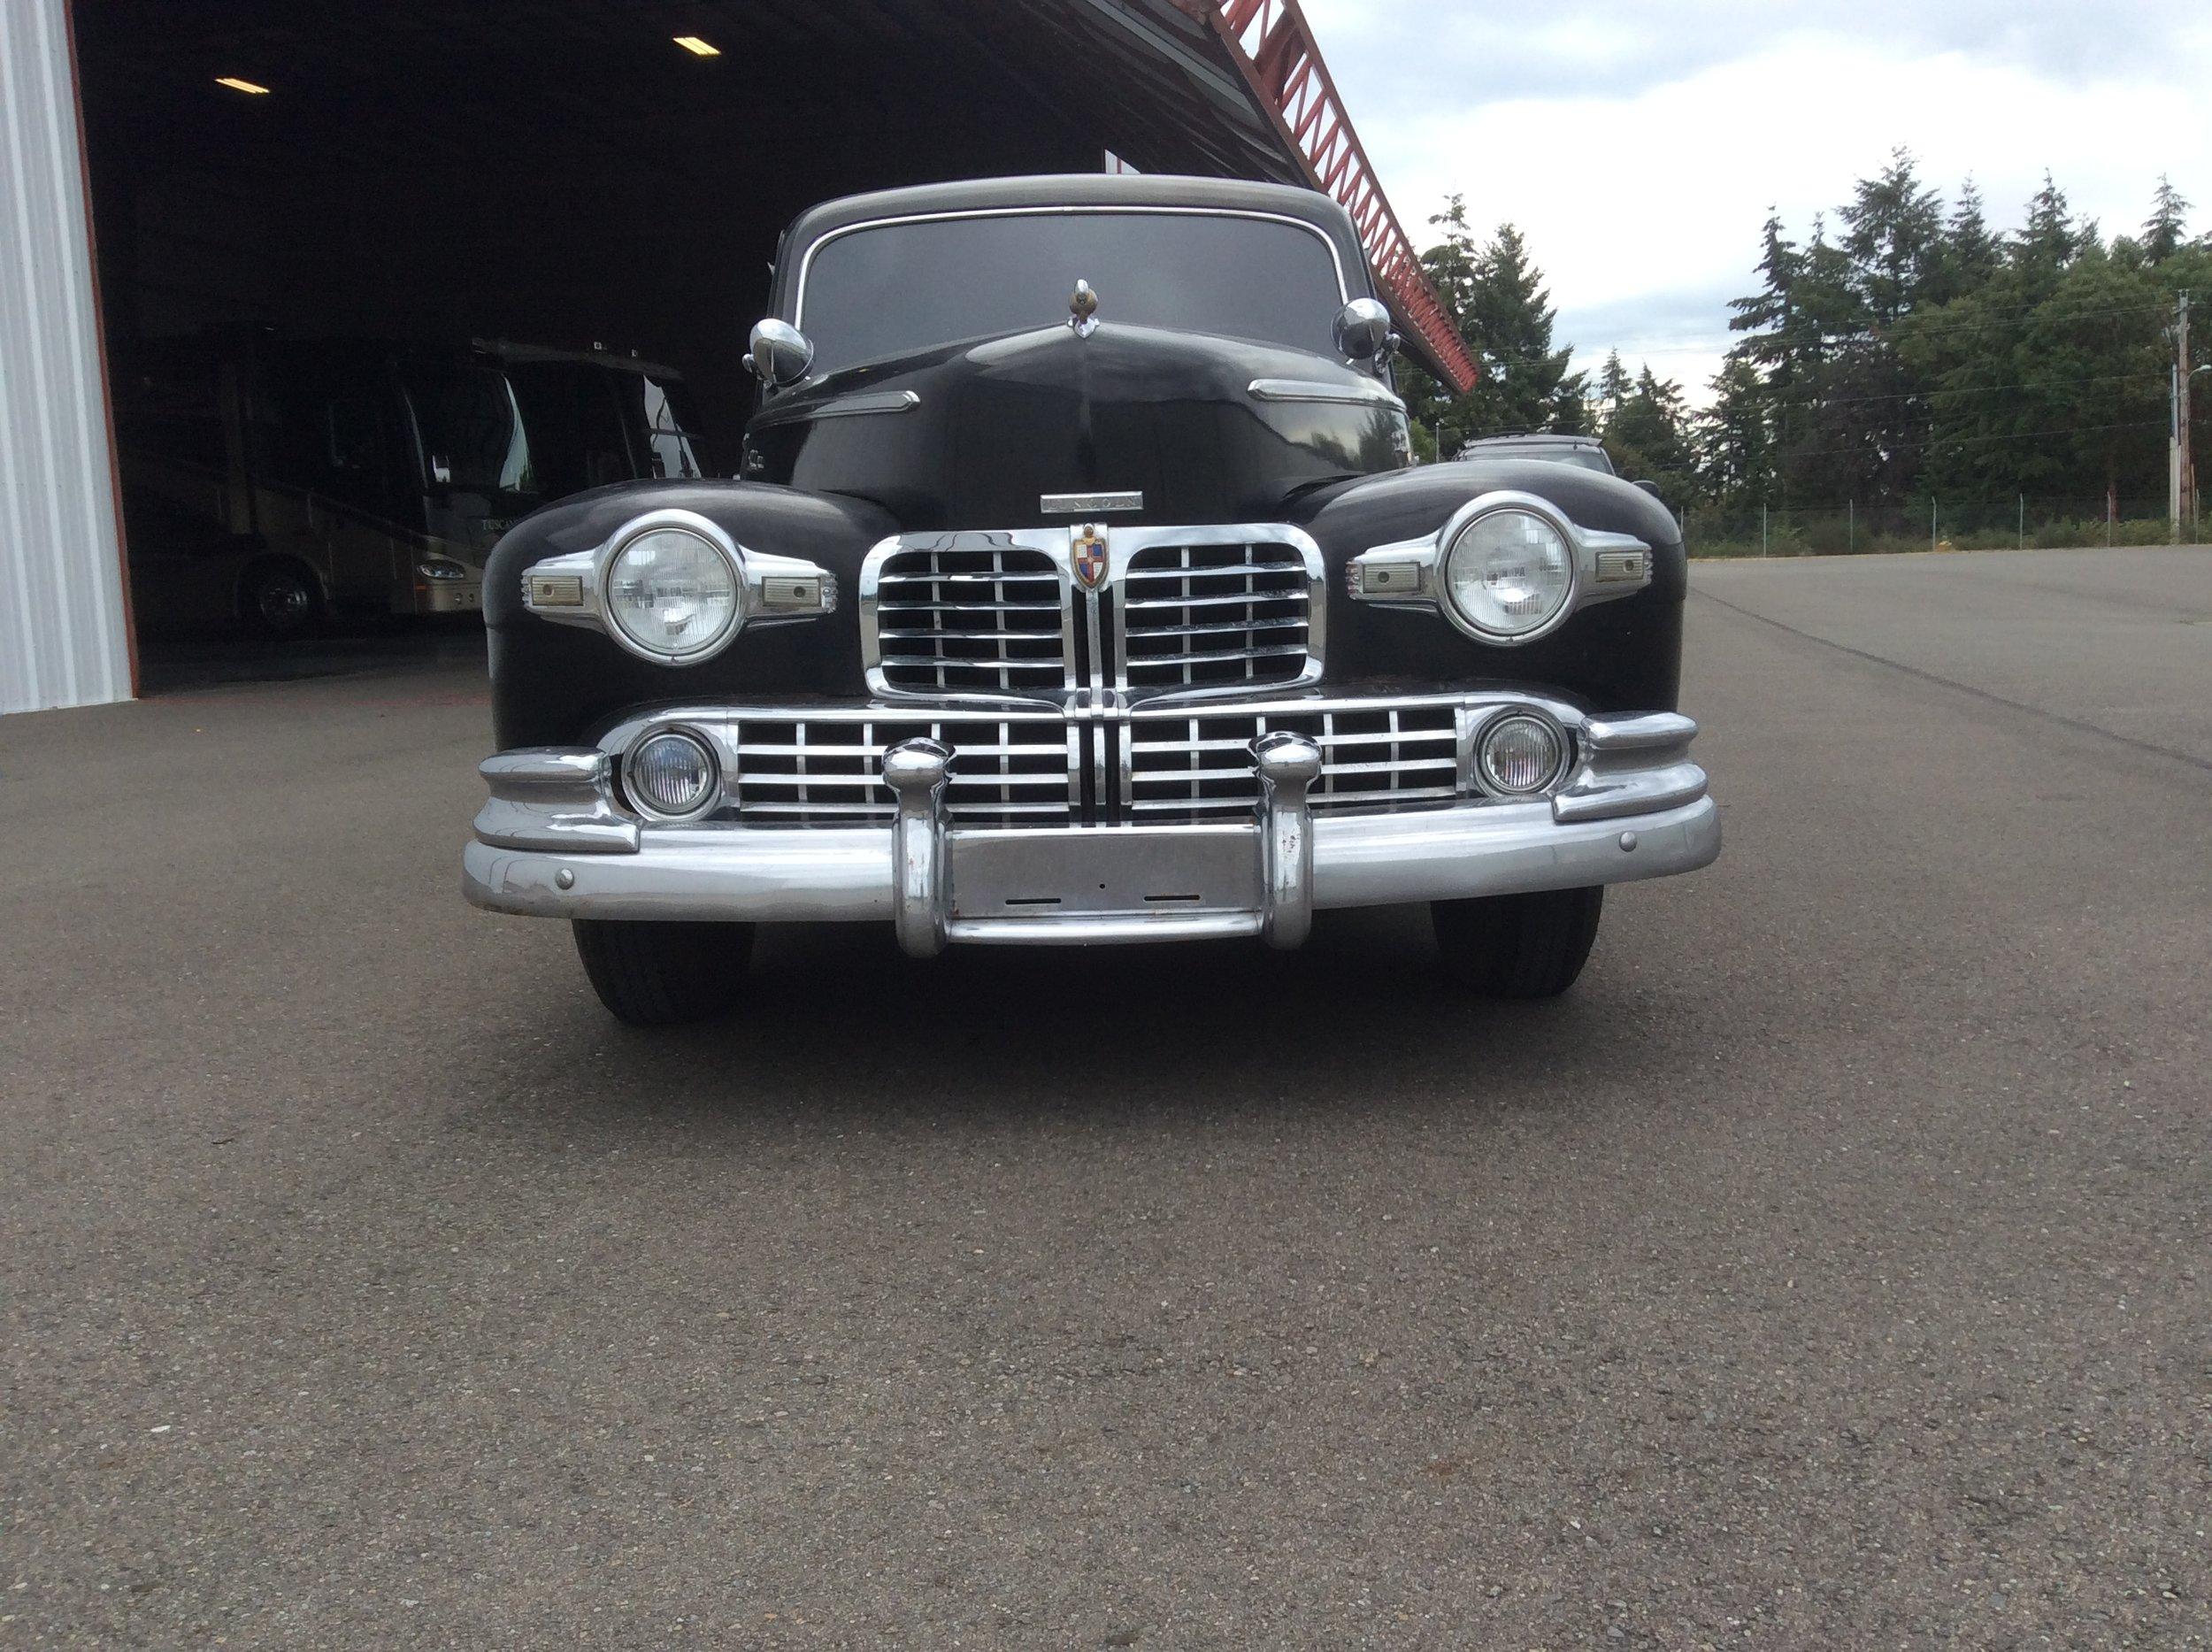 1948 Lincoln Zephyr (239).JPG